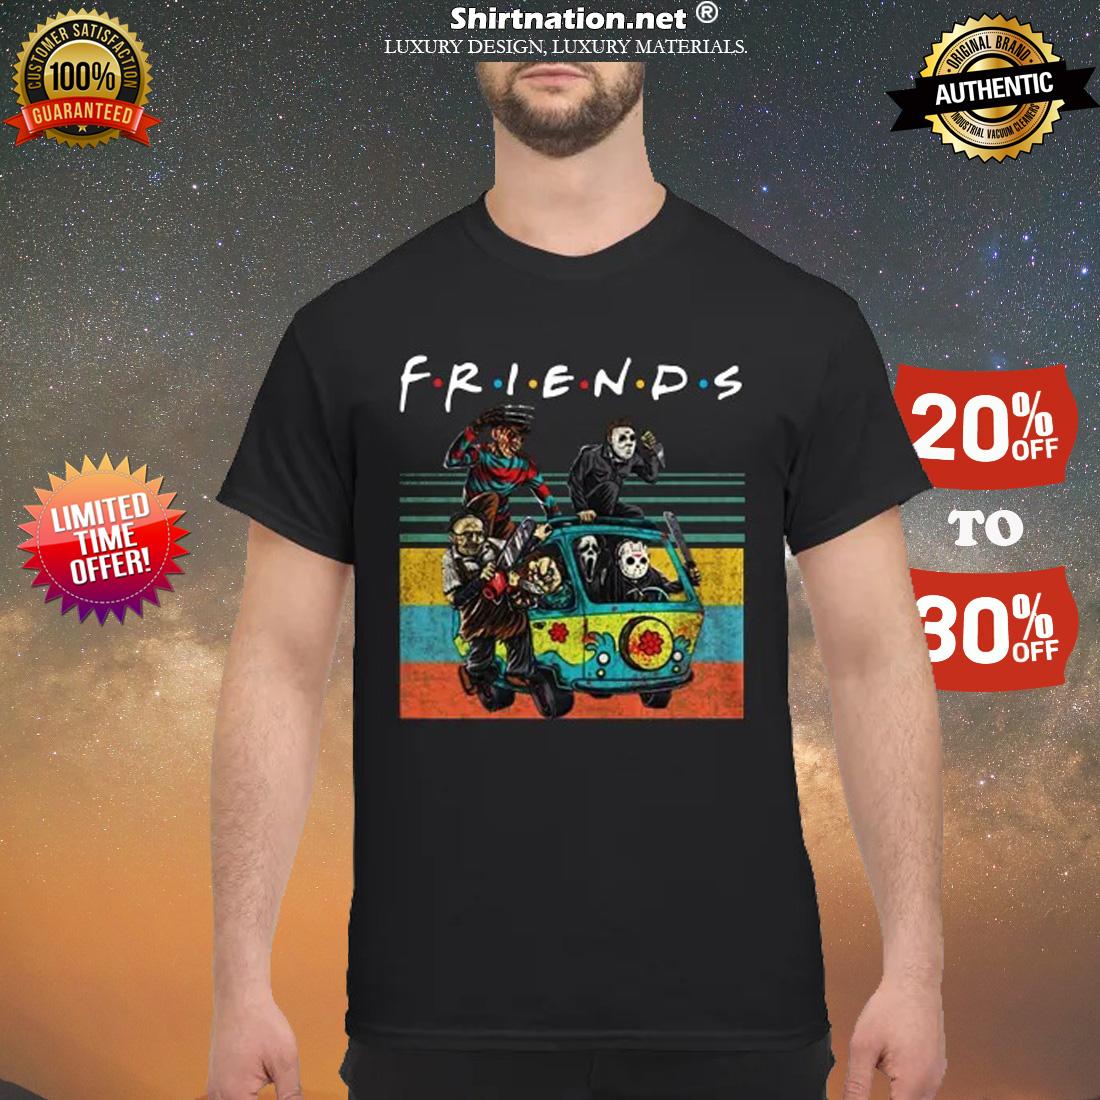 The Masscre machine friends shirt